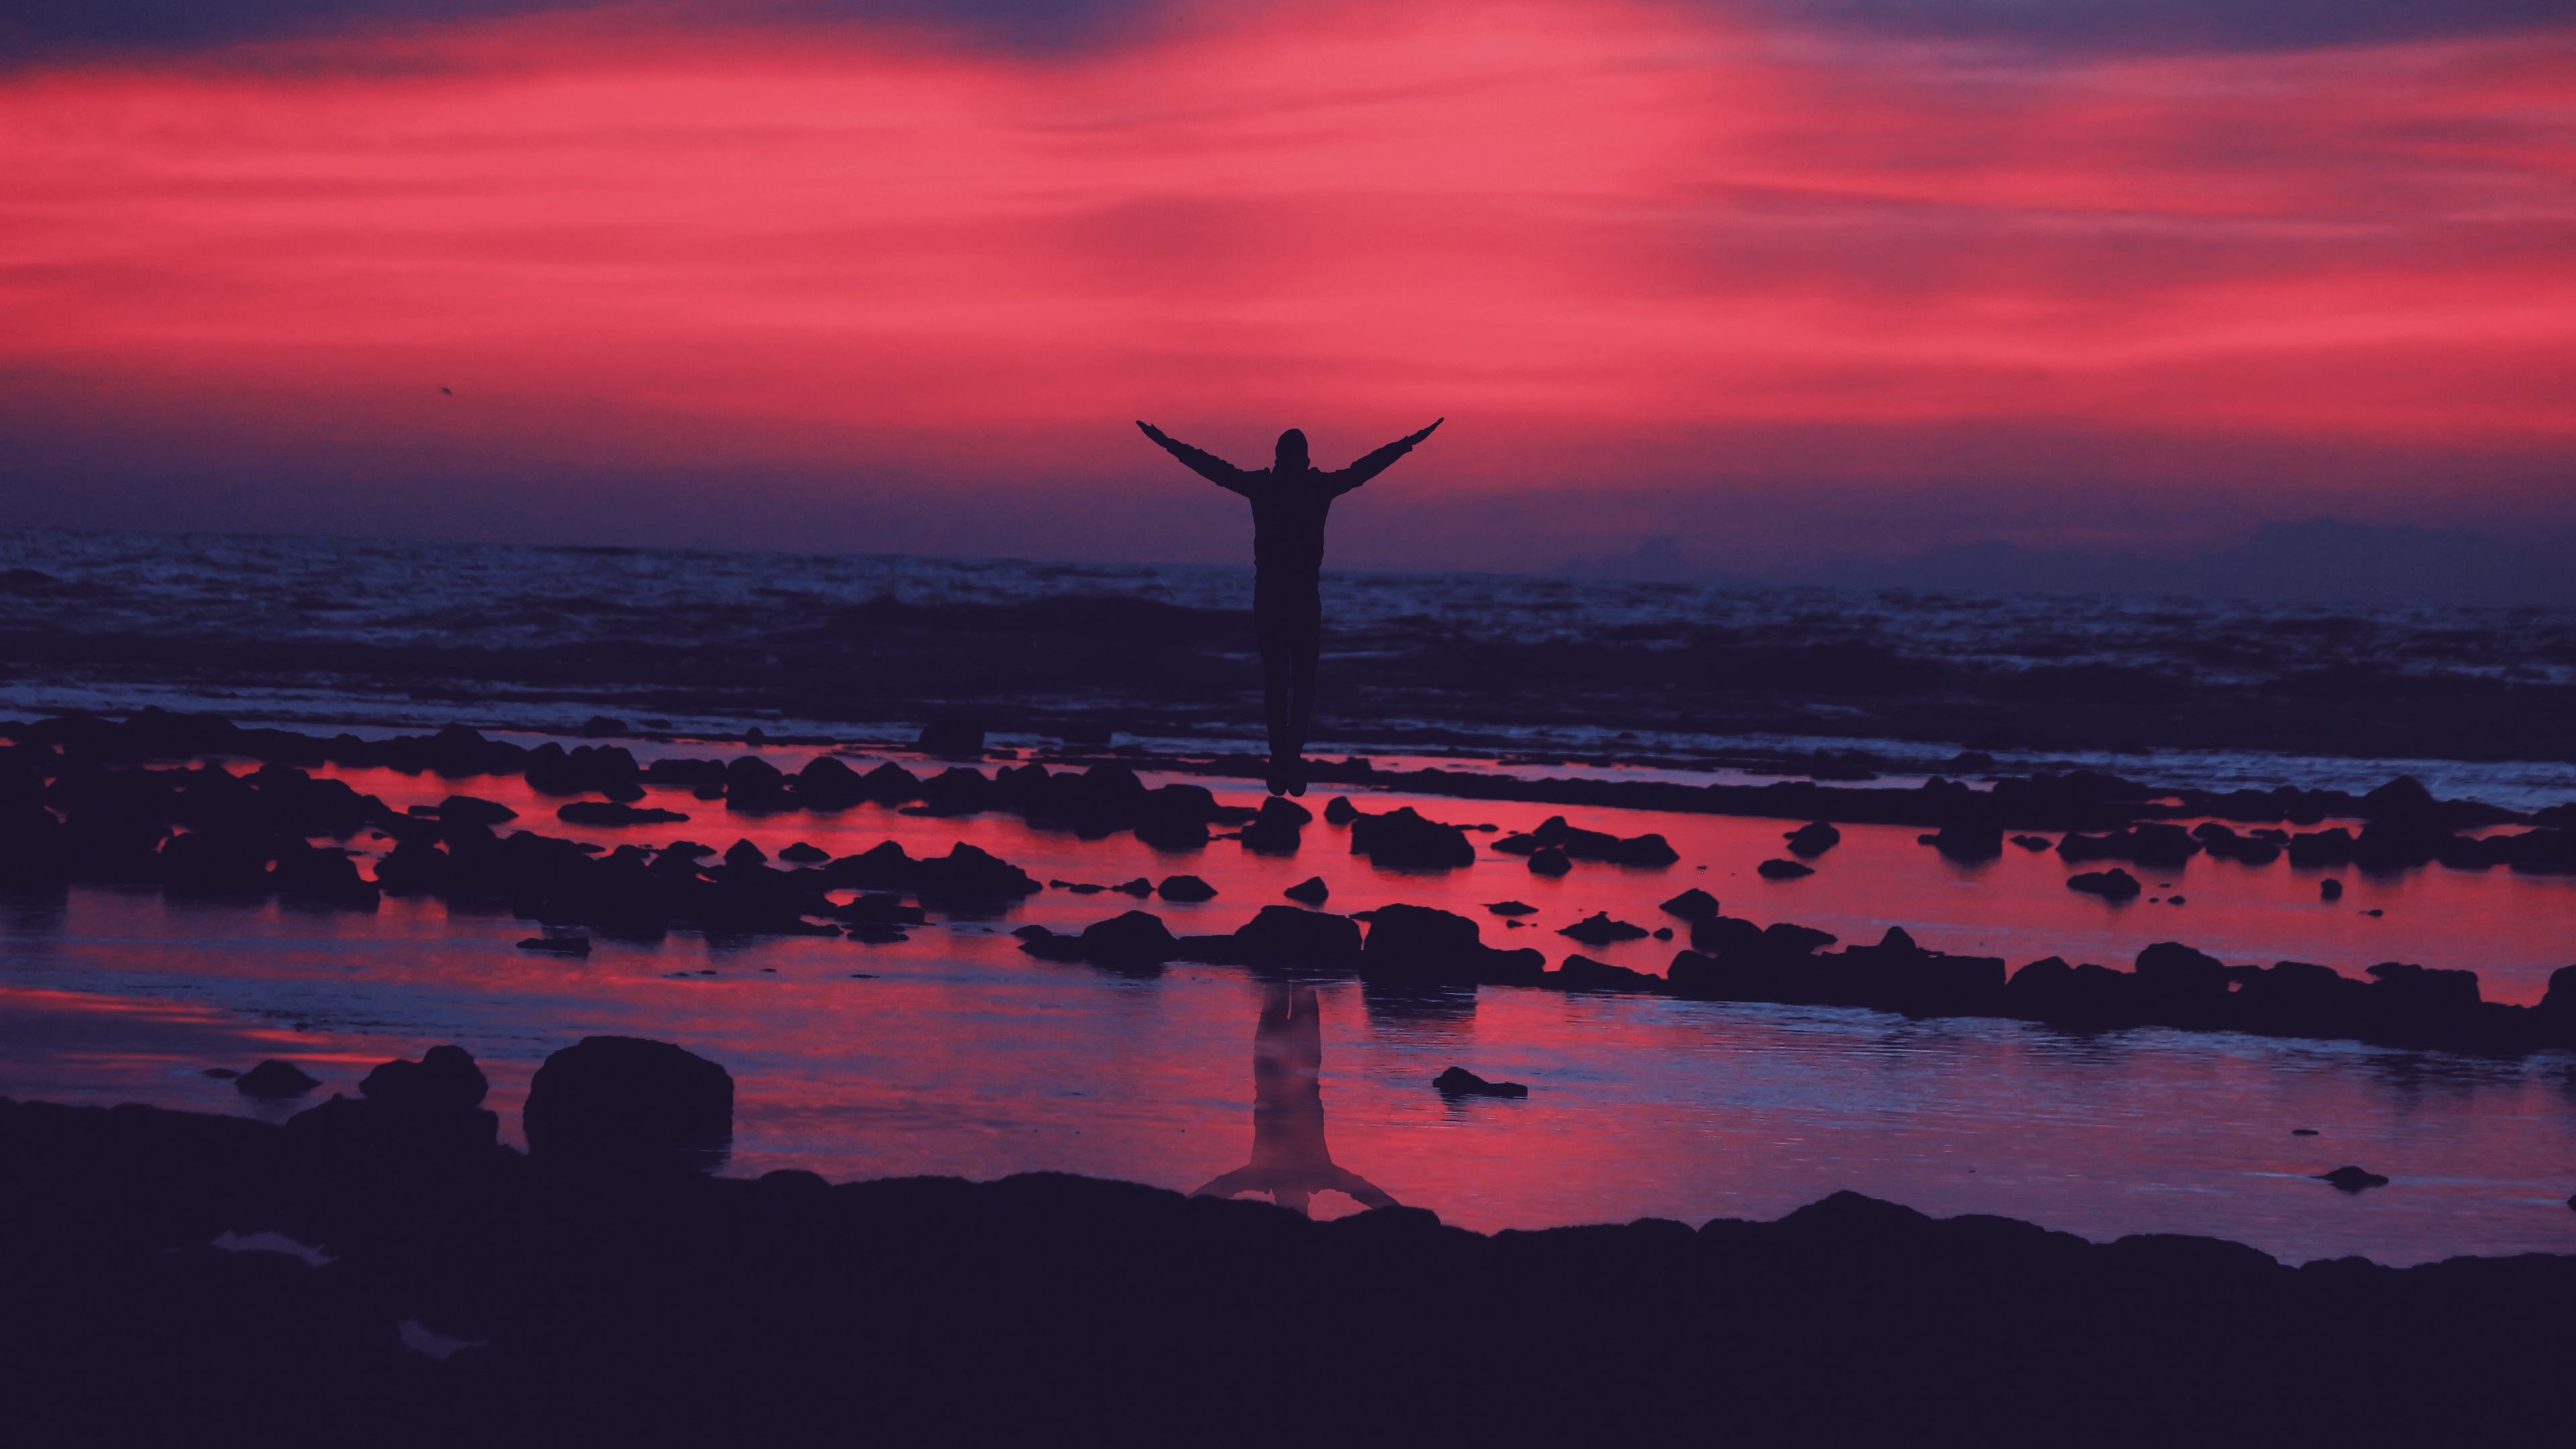 shore guy jump stones sunset 4k 1540574494 - shore, guy, jump, stones, sunset 4k - Shore, jump, guy